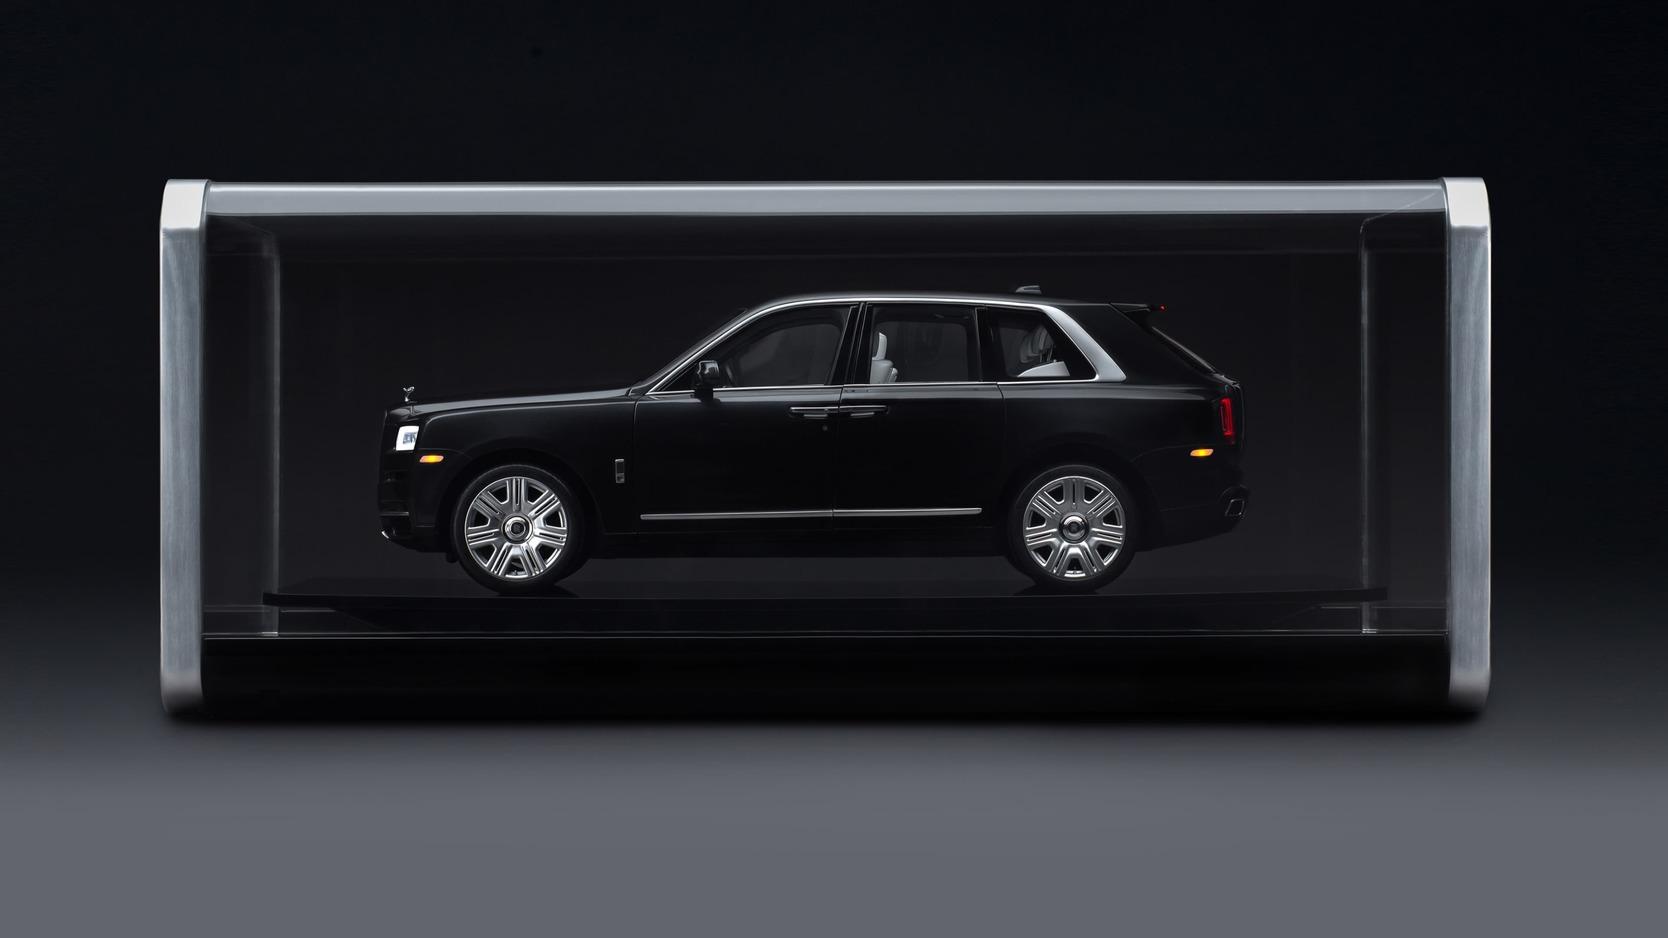 The Rolls Royce Cullinan